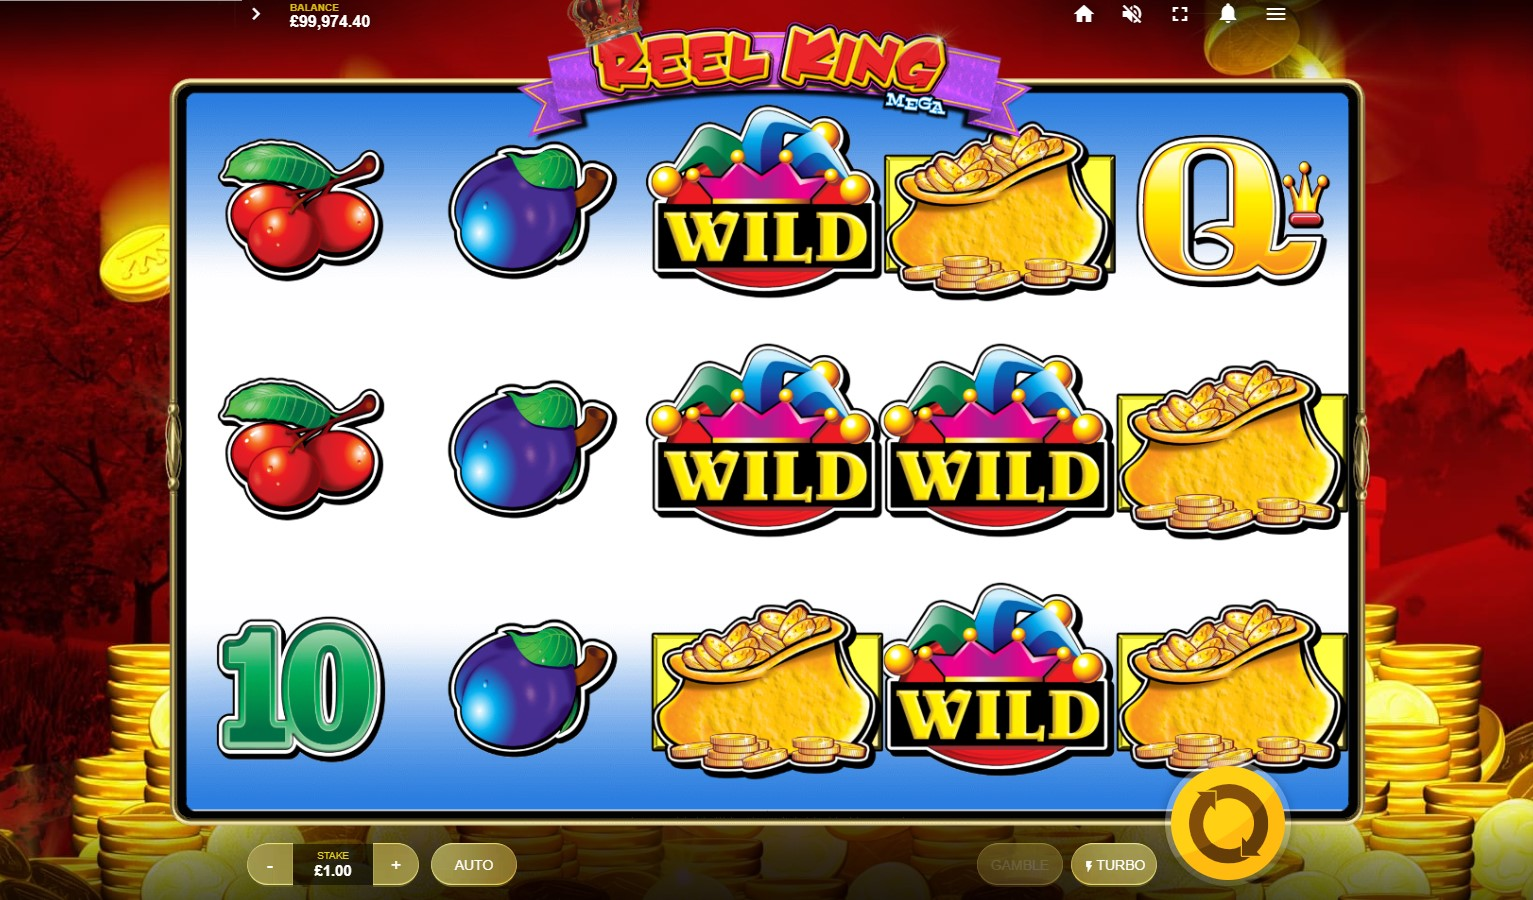 Base game screenshot from Red Tiger's Reel King Mega video slot